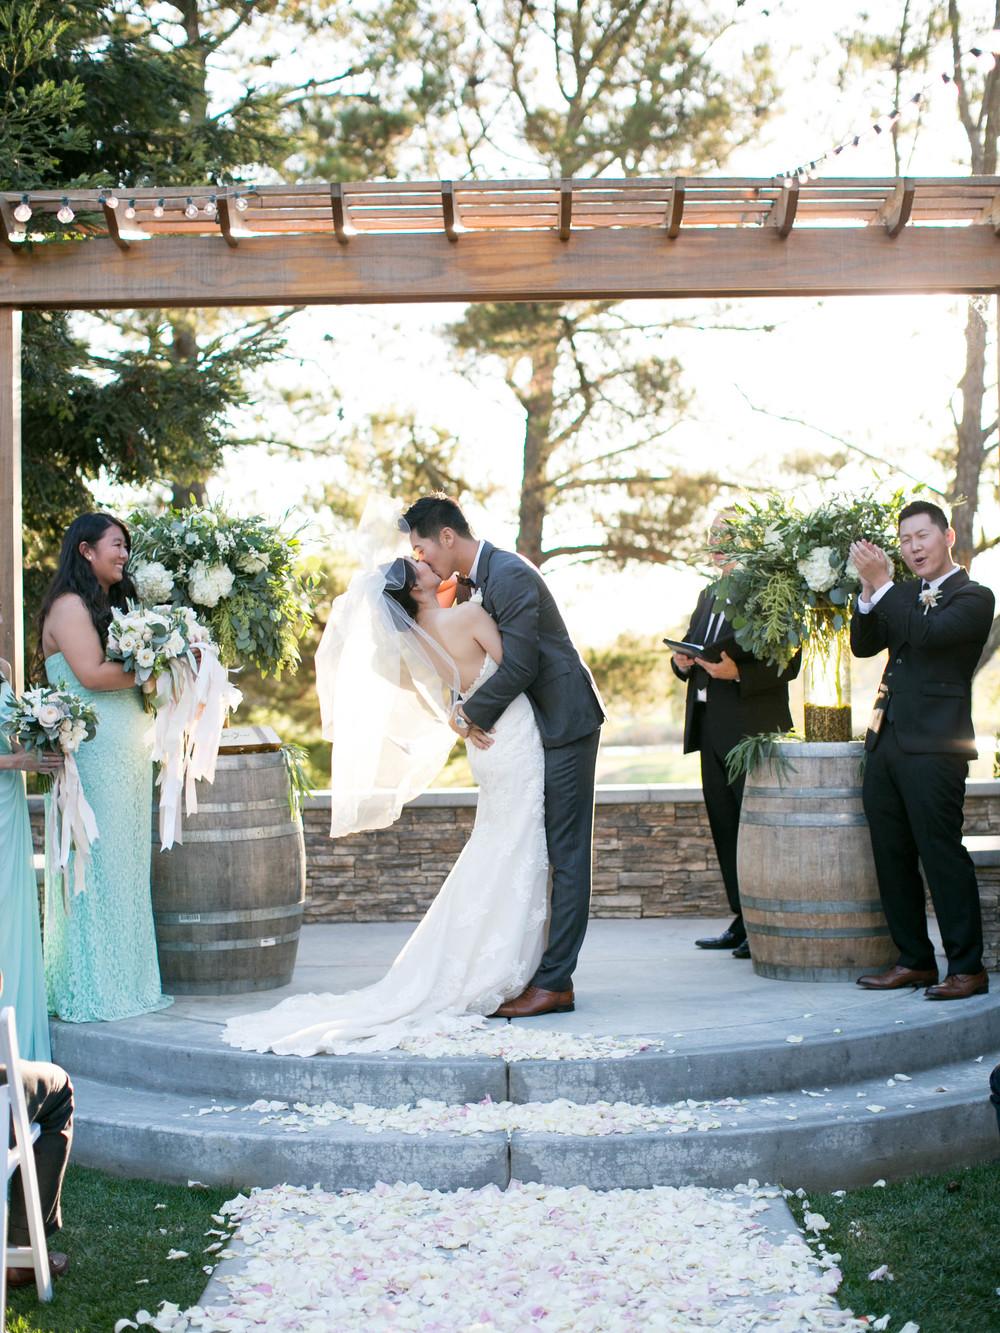 Meghan Mehan Photography - Fine Art Film Photography - Nashville | San Francisco | Napa | Sonoma | Big Sur | Carmel | Tennessee 103.jpg